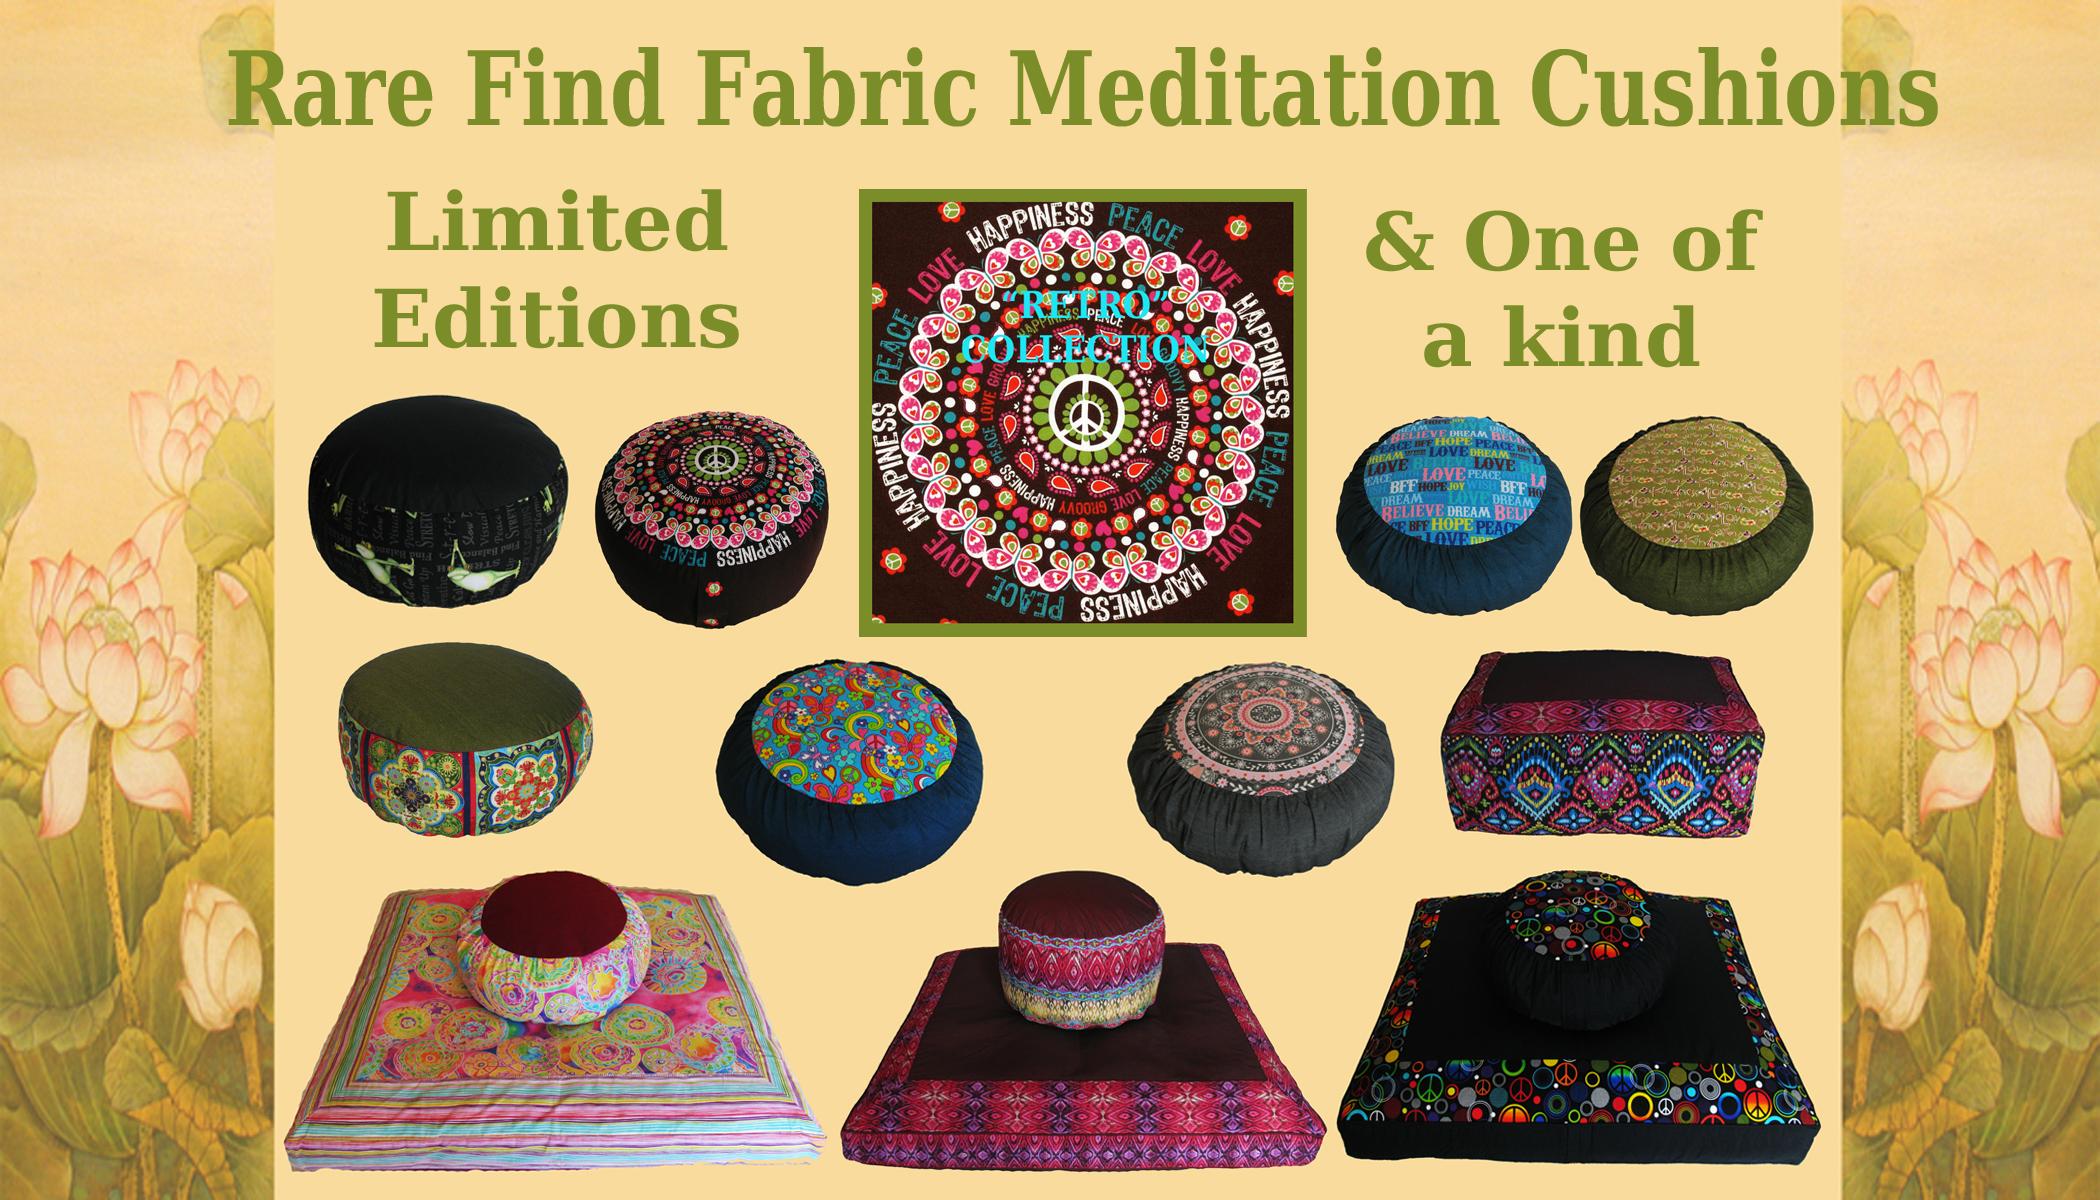 rare-find-fabrics.jpg